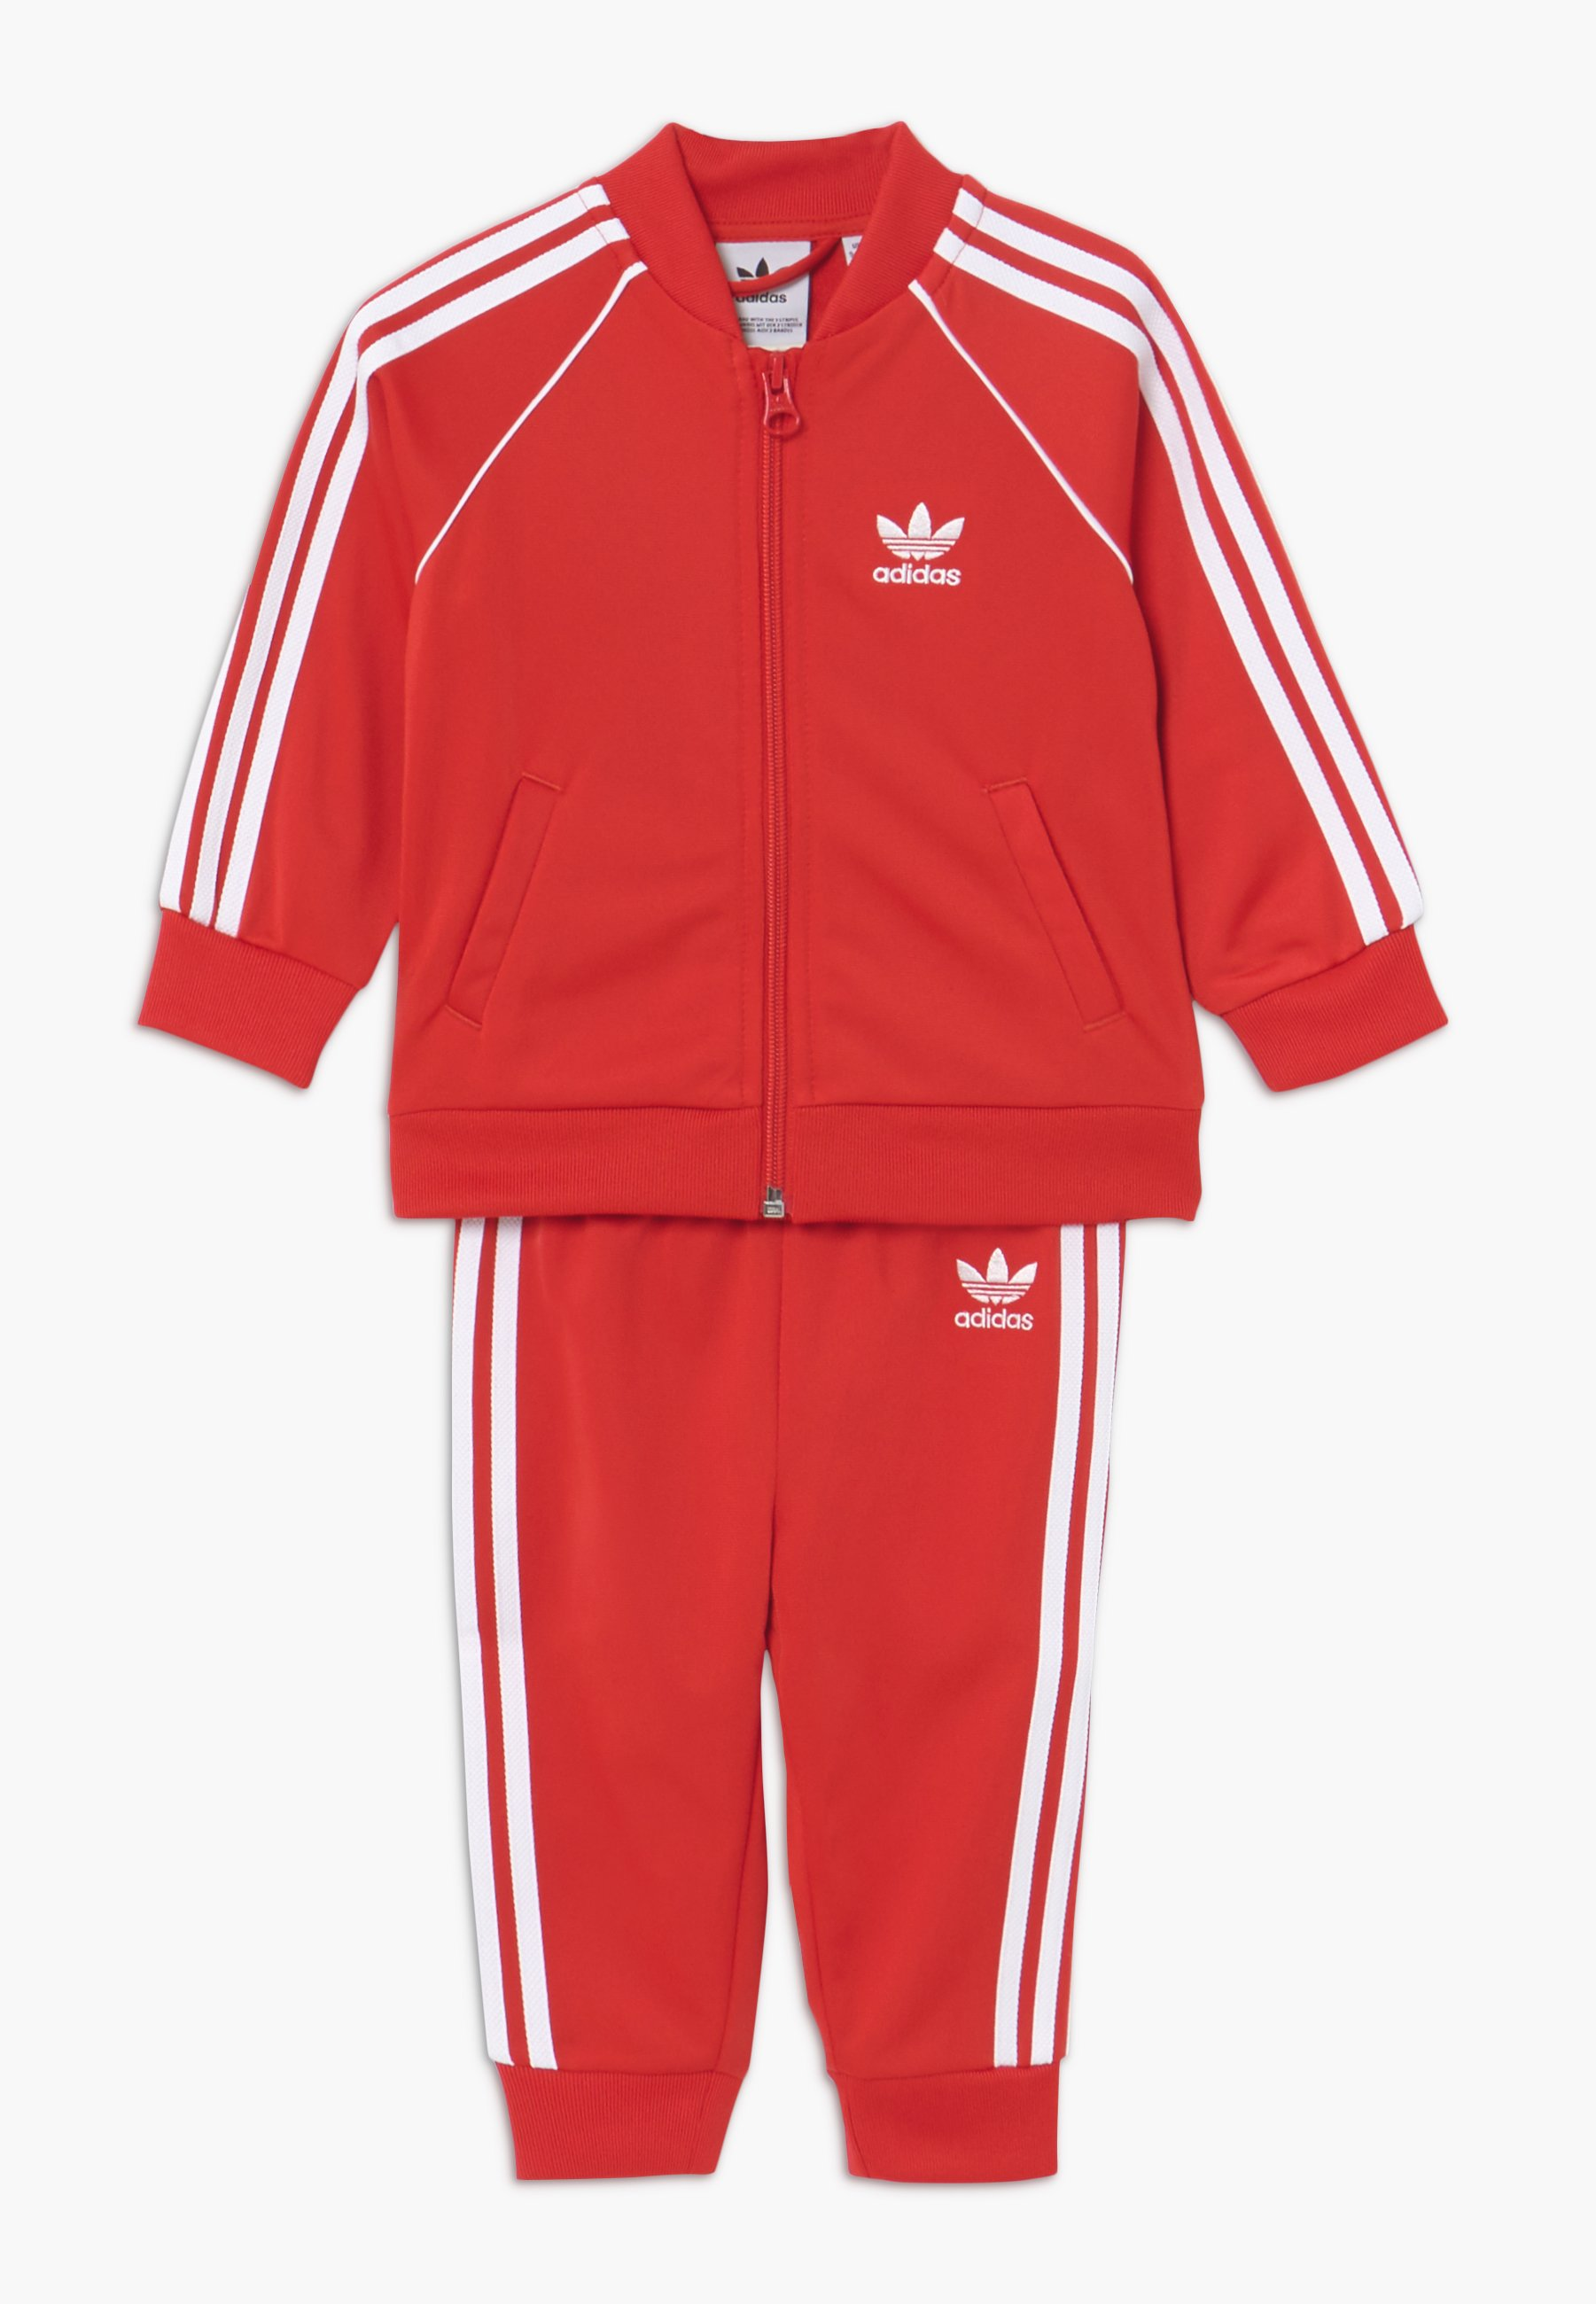 adidas Originals Zip Crew Track Top RedC WhiteN Indigo